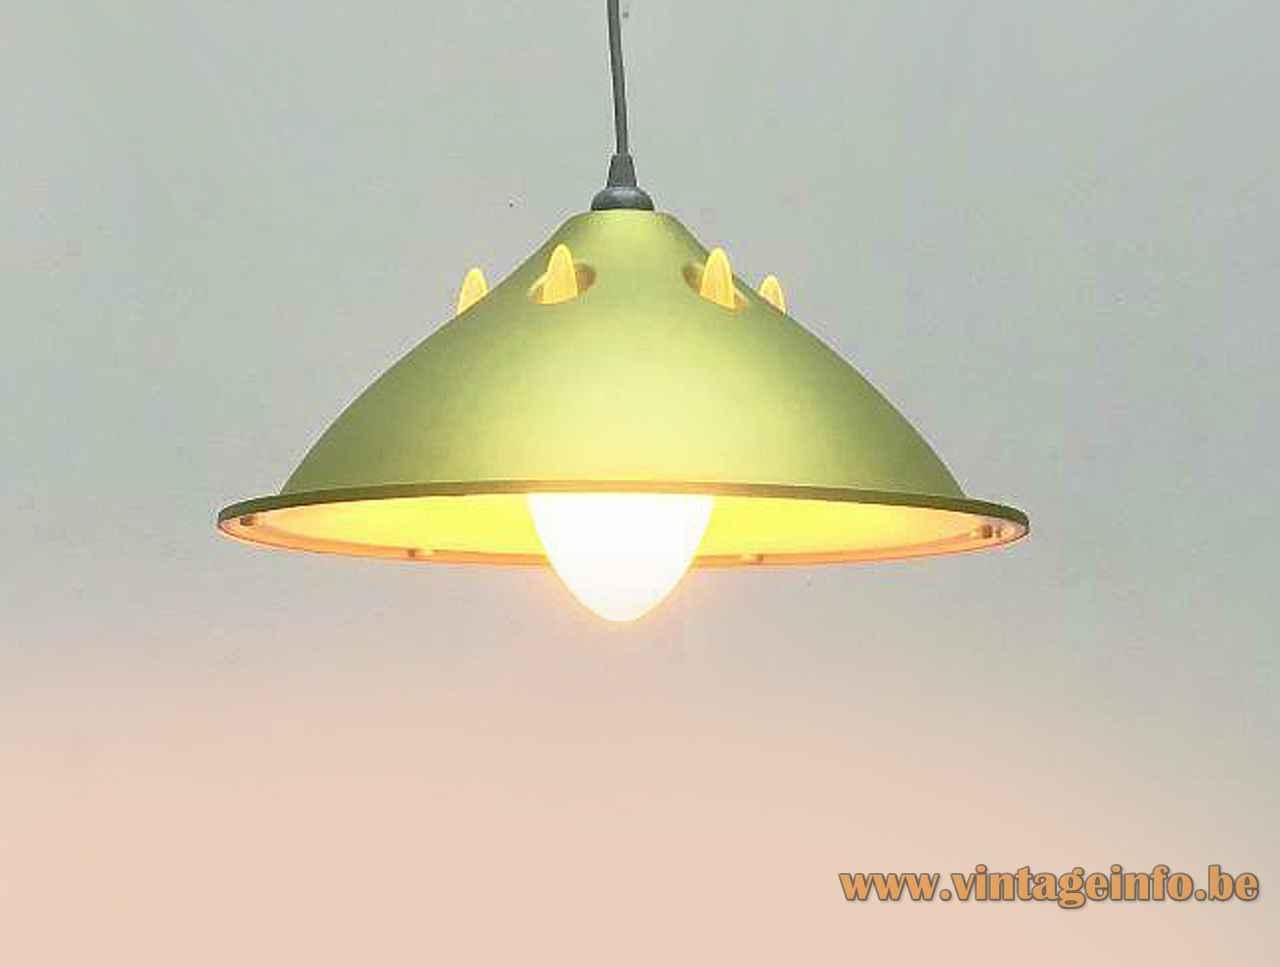 FLOS Light Lite pendant lamp silver green plastic lampshade translucent diffuser 1991 design Philippe Starck Italy